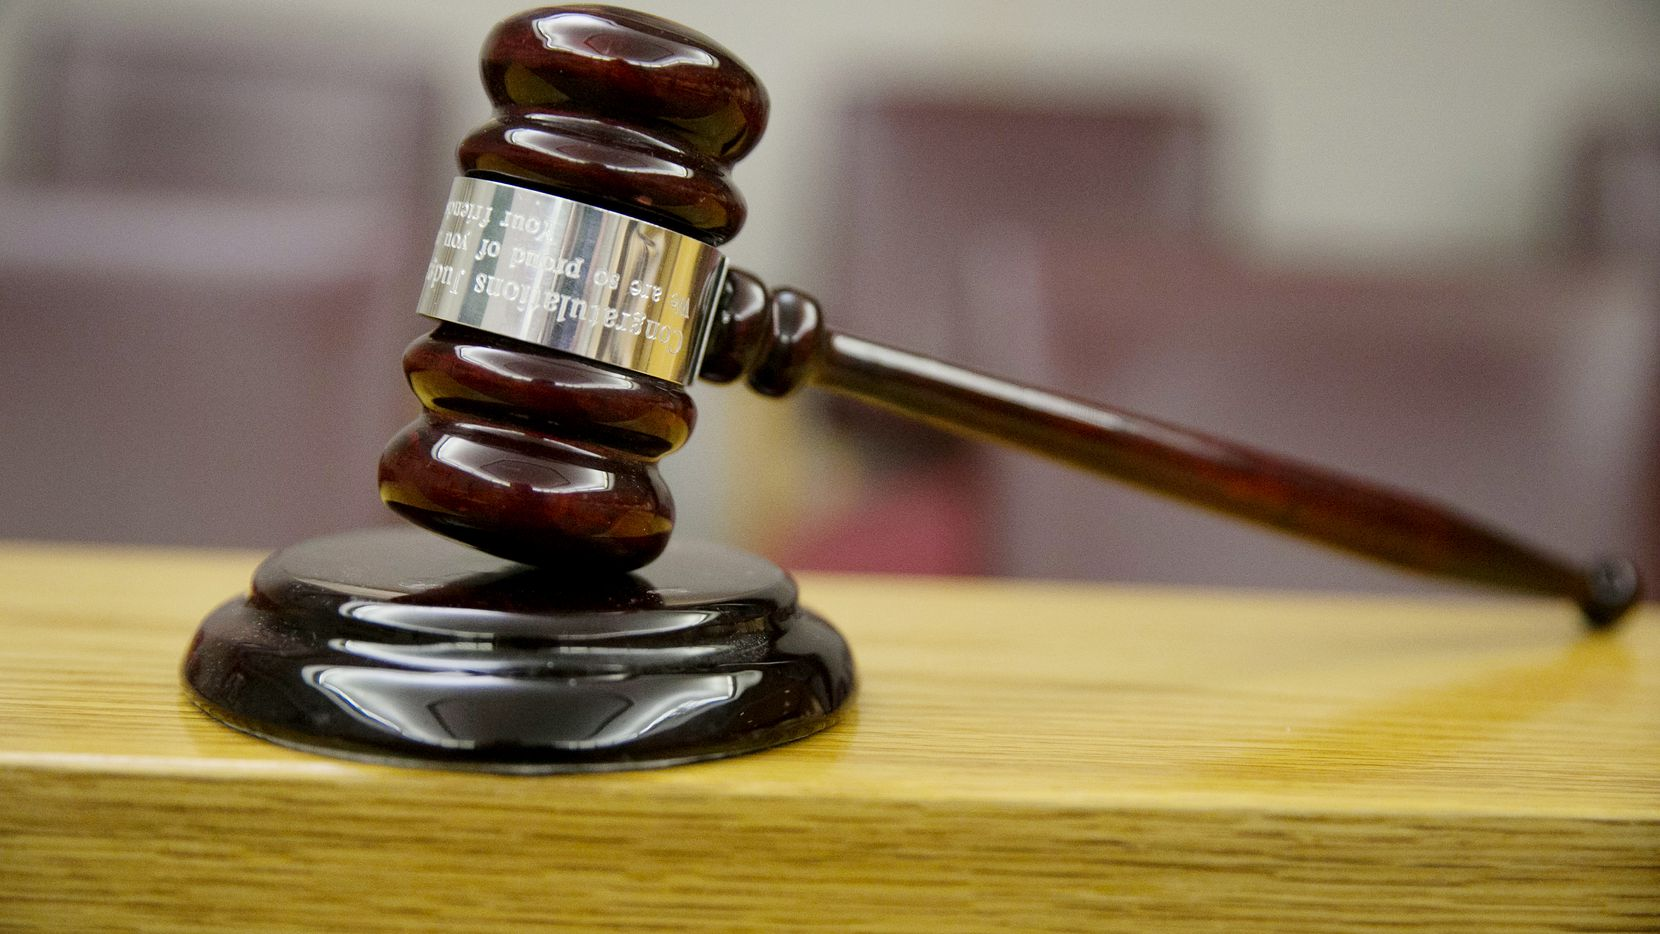 La Corte Suprema de Texas falló a favor de la apelación del gobernador Greg Abbott.